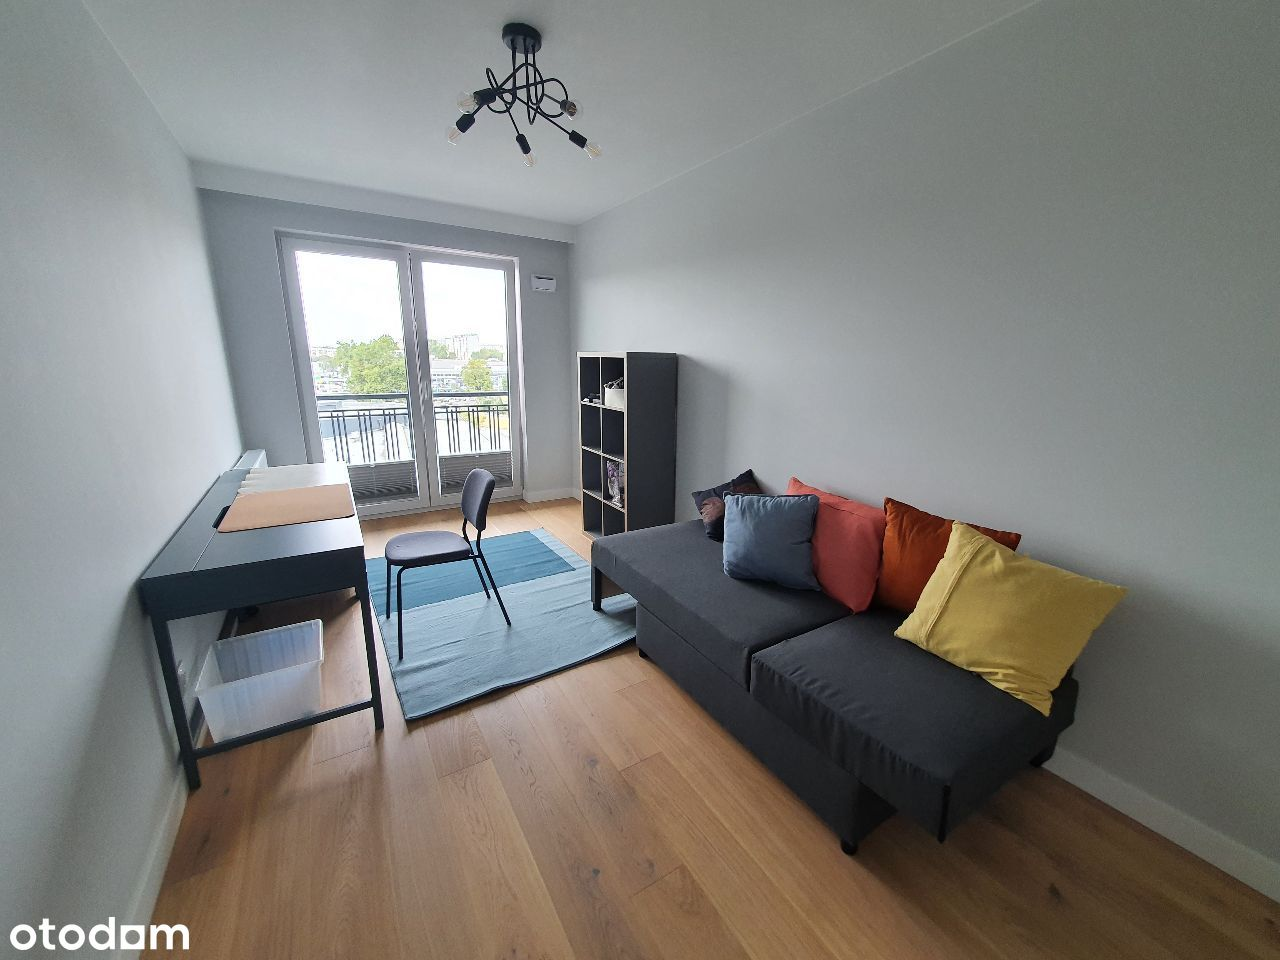 Pokój z balkonem dla studenta